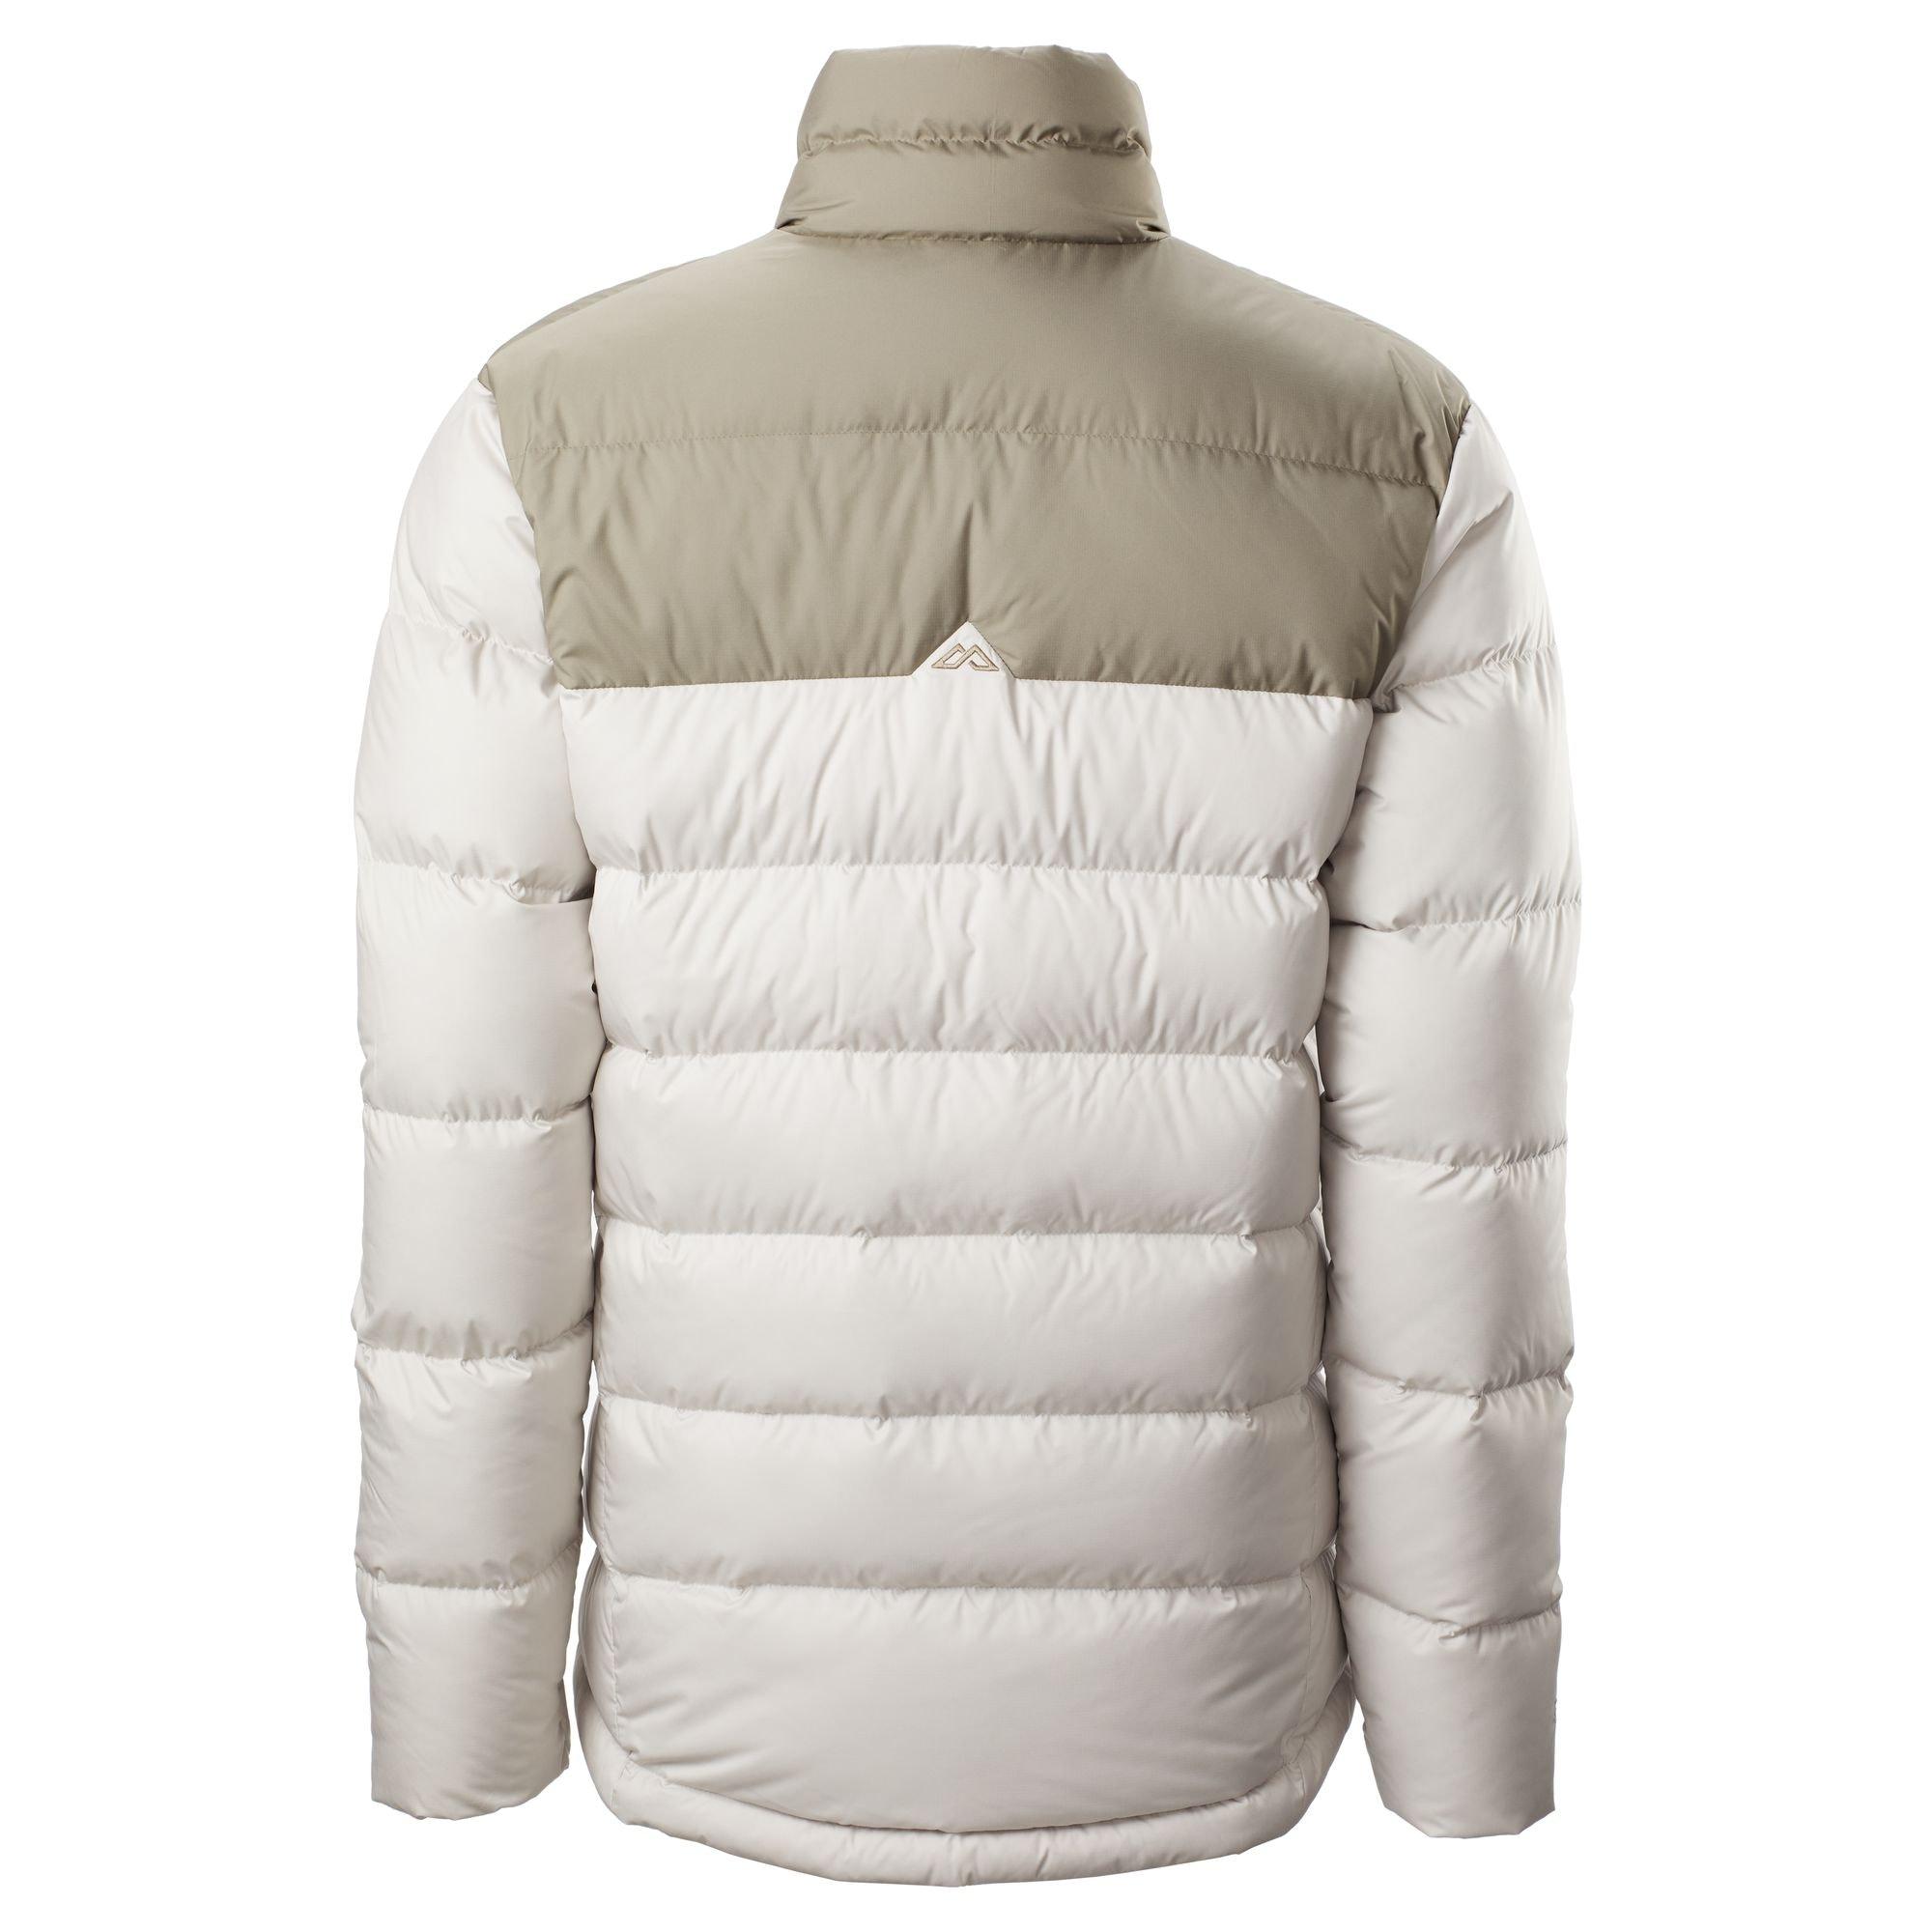 NEW-Kathmandu-Epiq-Men-039-s-Warm-Winter-Duck-Down-Puffer-Jacket-v2 thumbnail 14